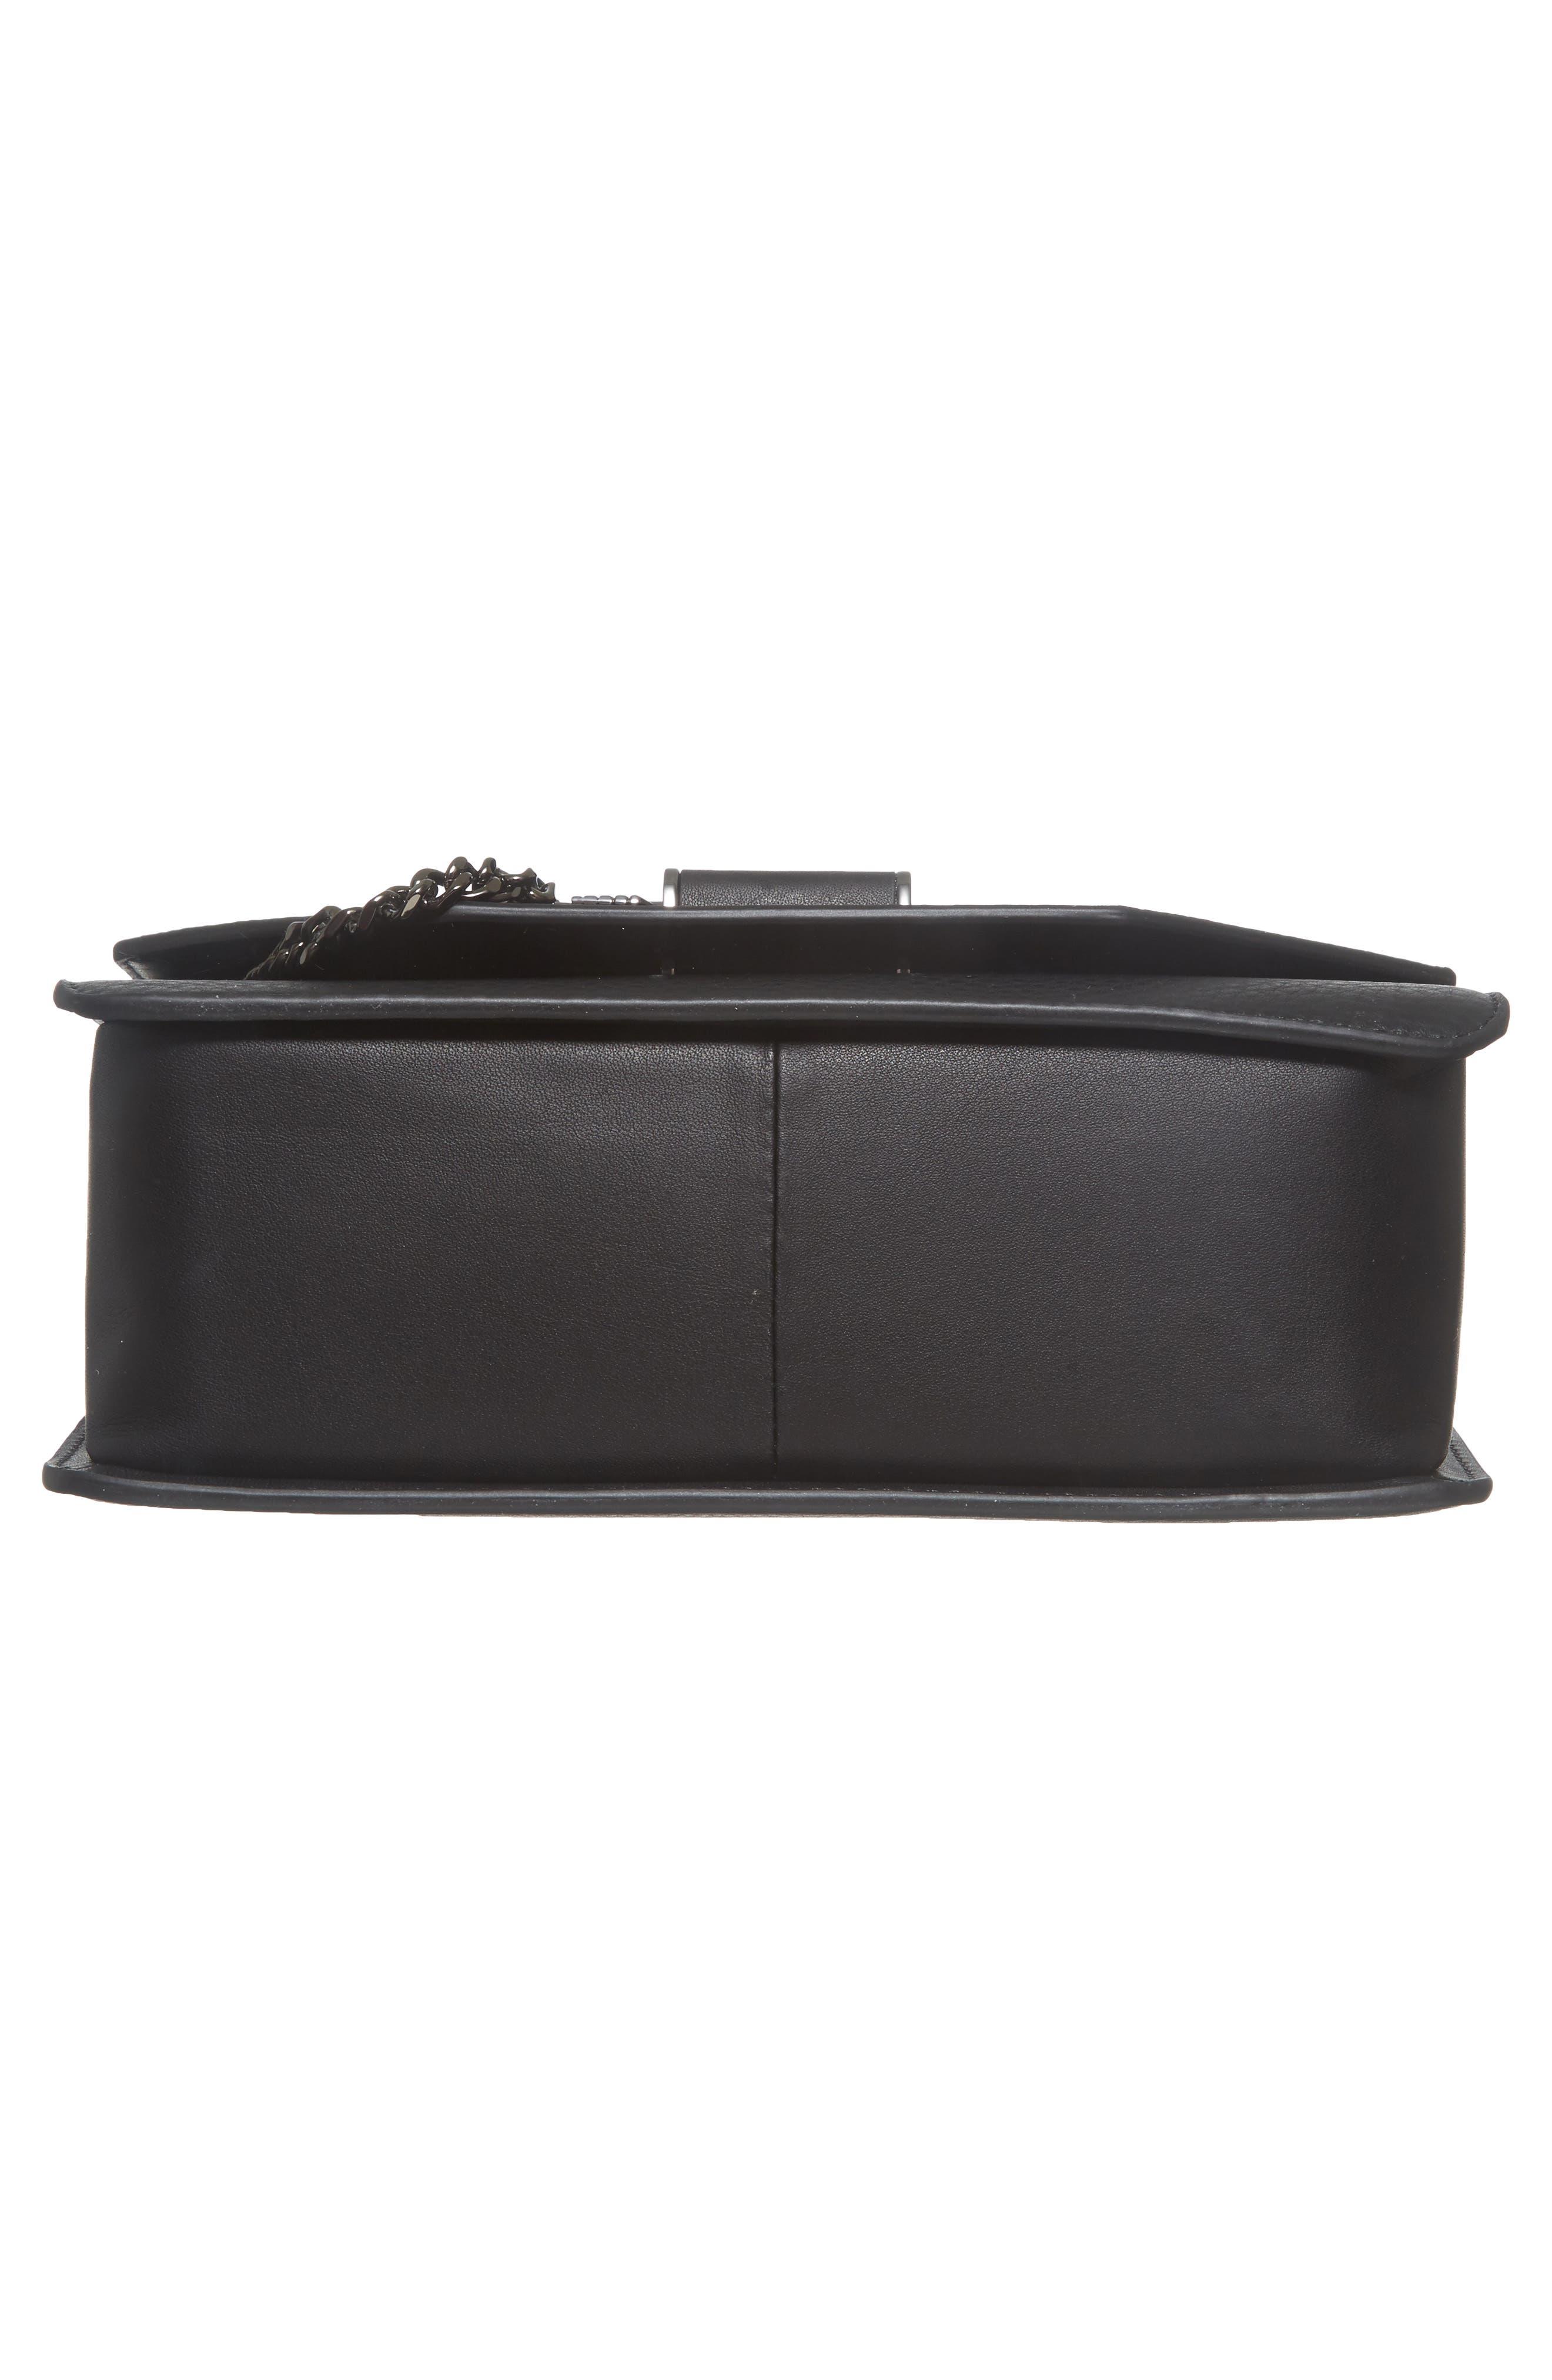 Cortney Nappa Leather Shoulder/Crossbody Bag,                             Alternate thumbnail 21, color,